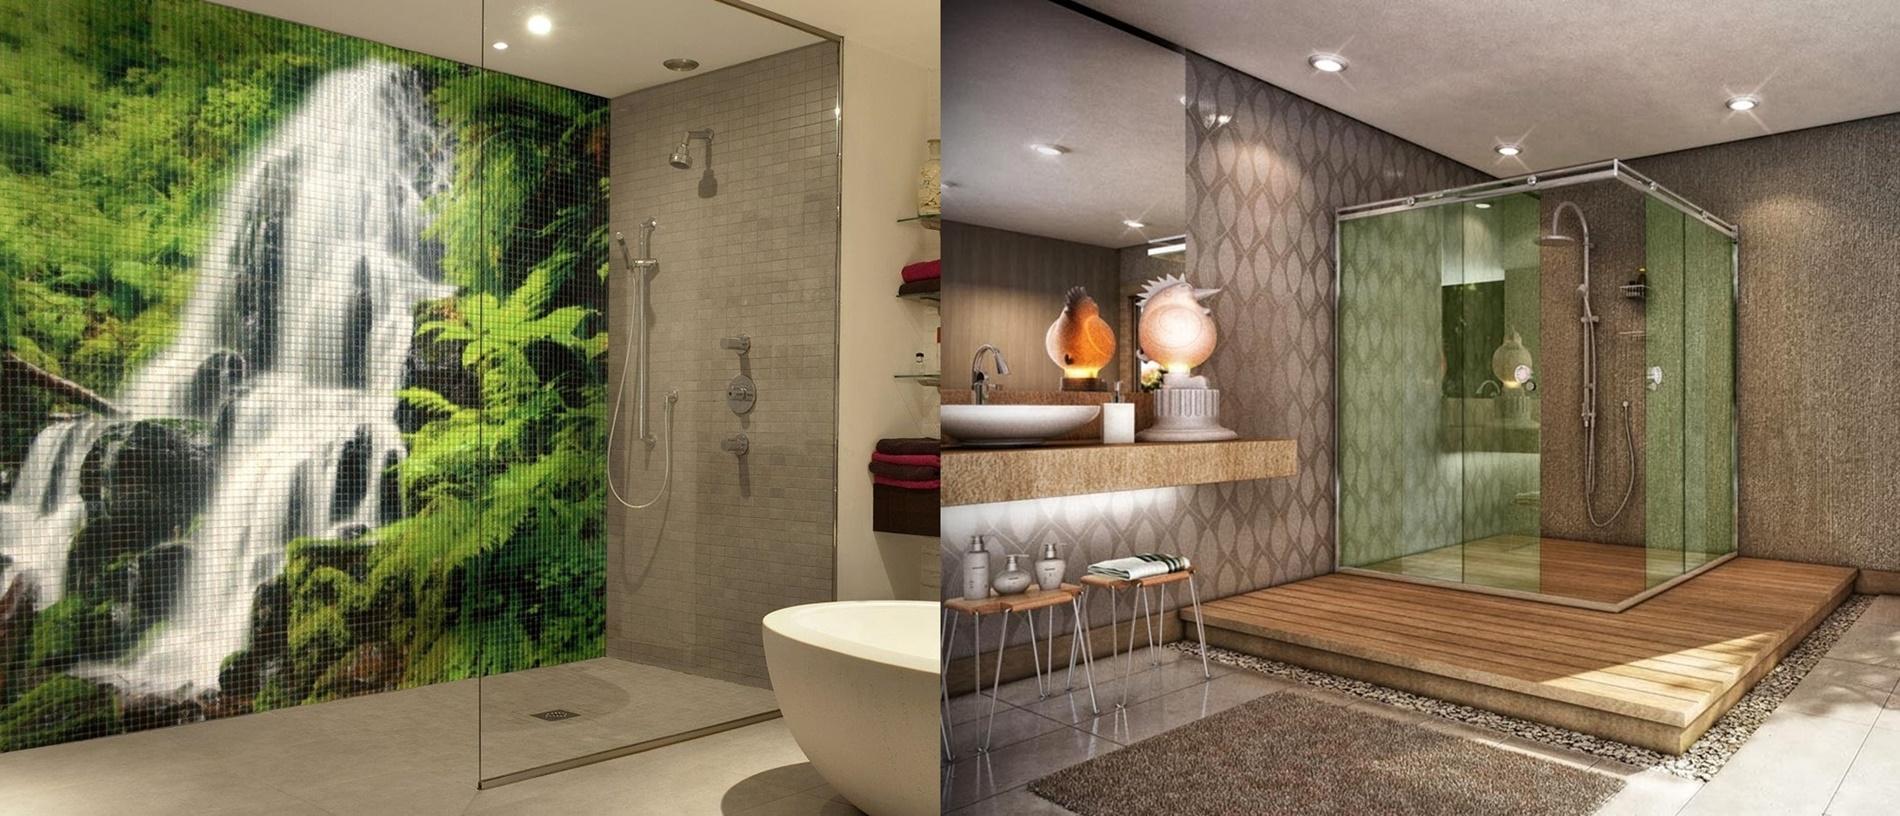 1-tudo-de-vidro-box-banheiro